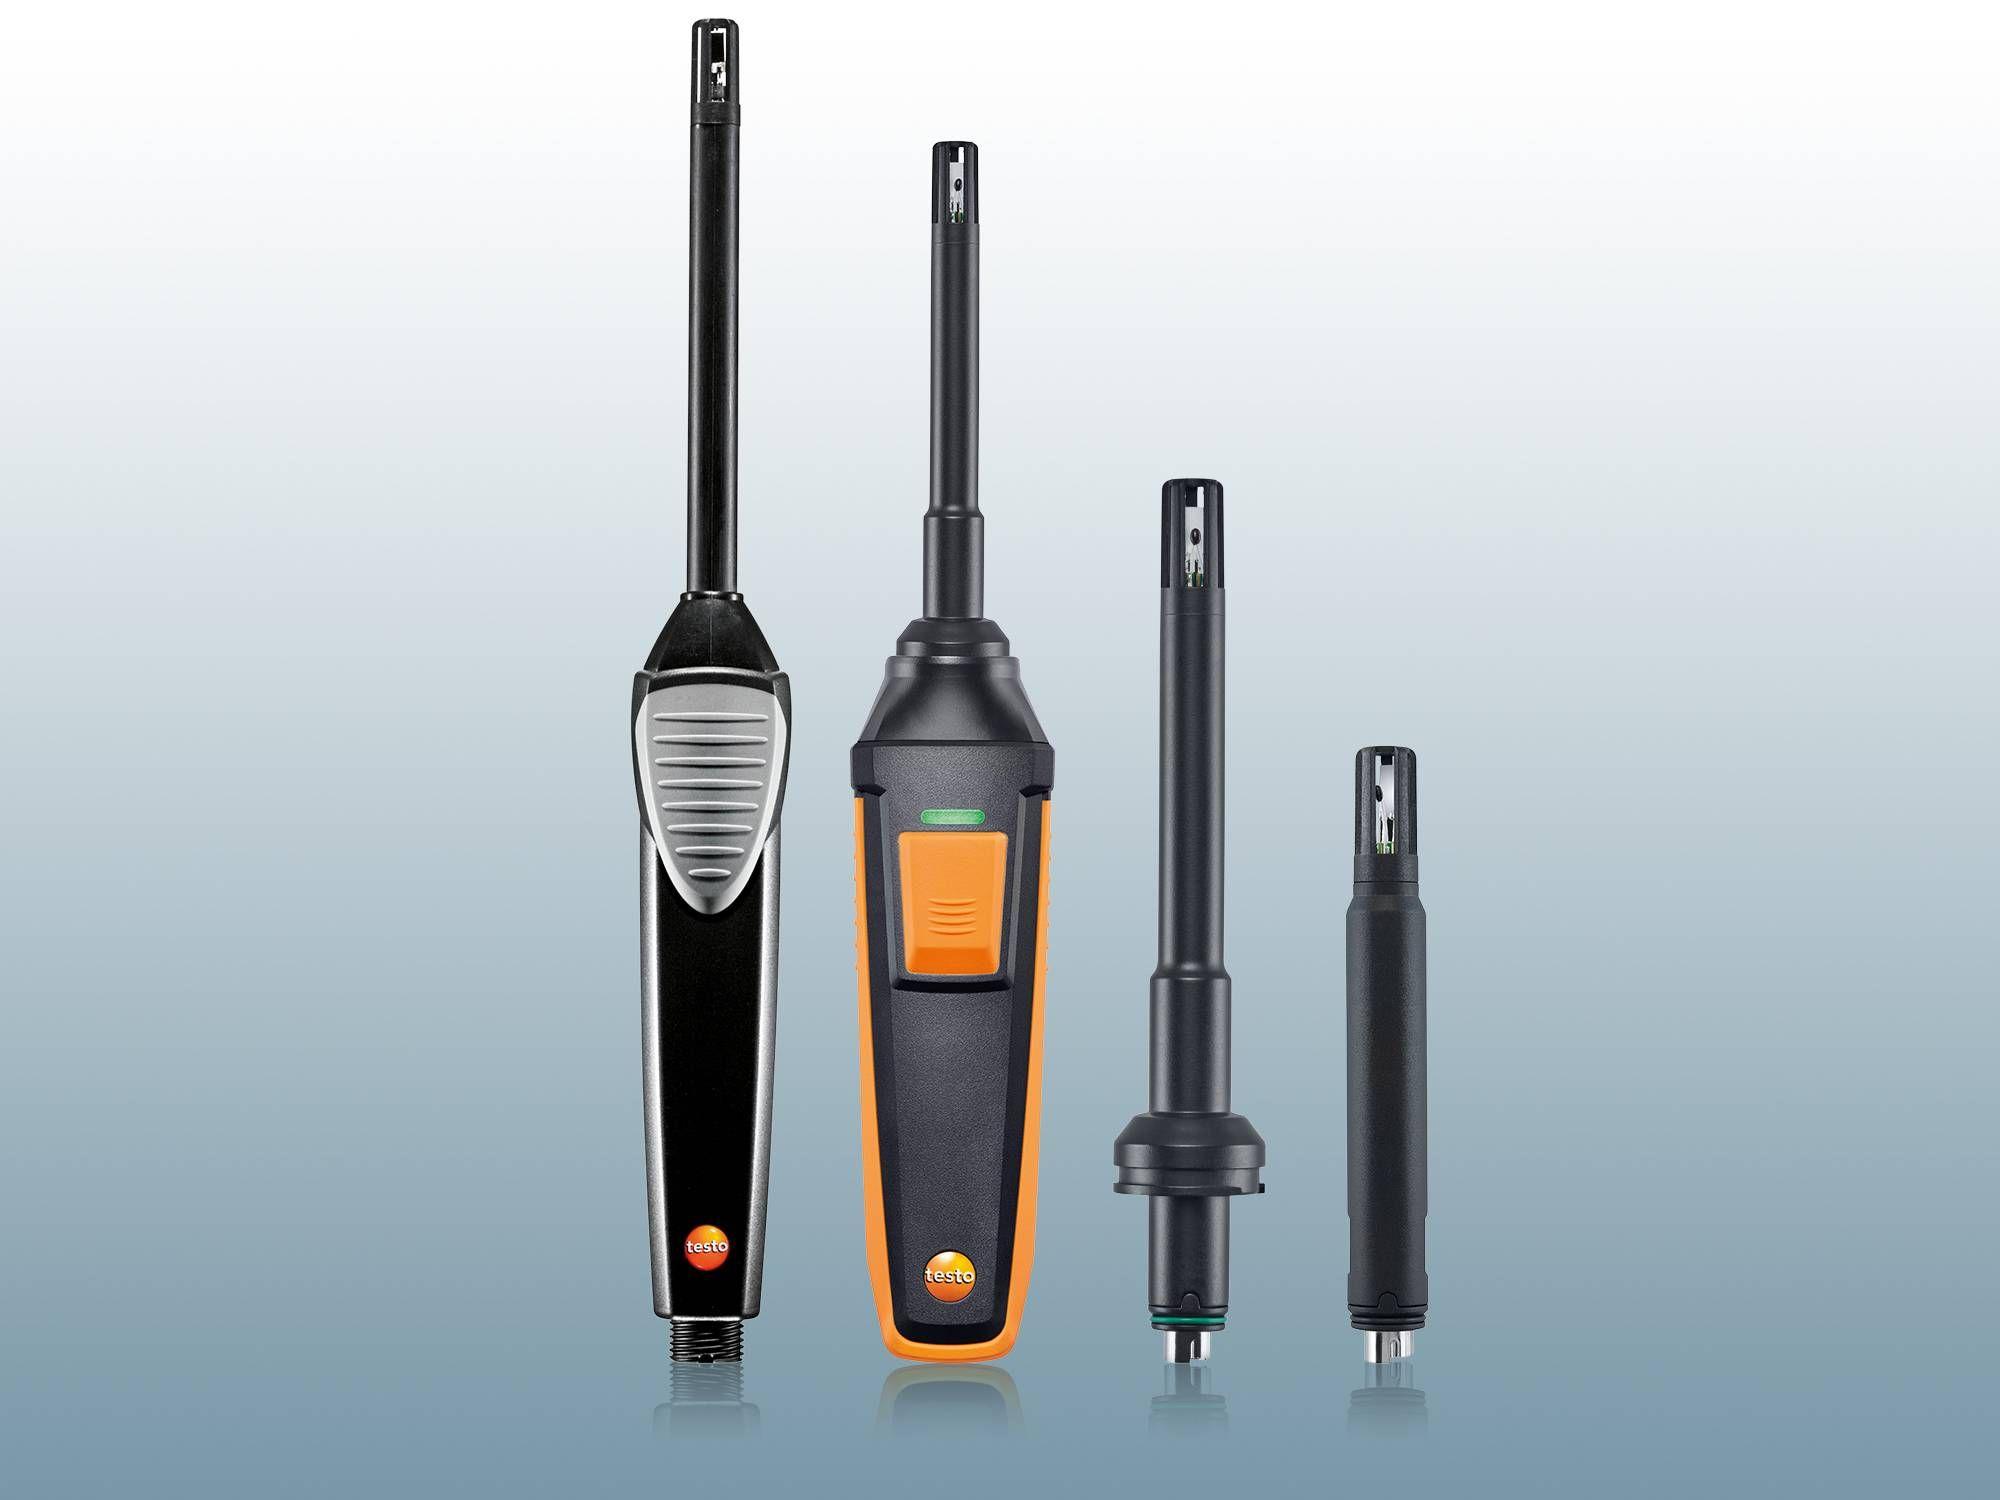 Testo higrometre